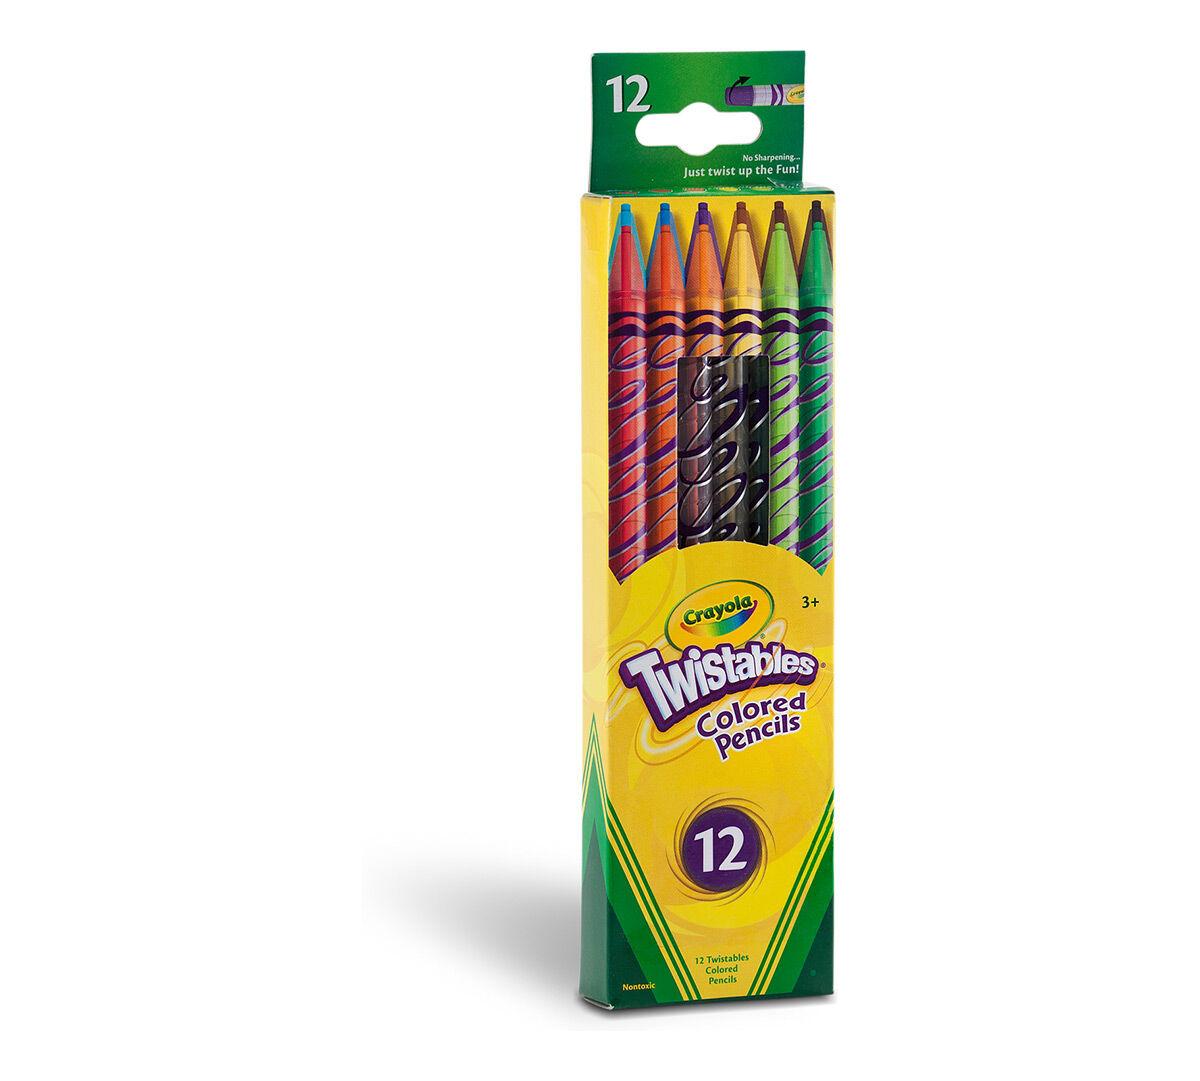 Crayola Twistables Colored Pencils Always Sharp Art Tools 12 Count